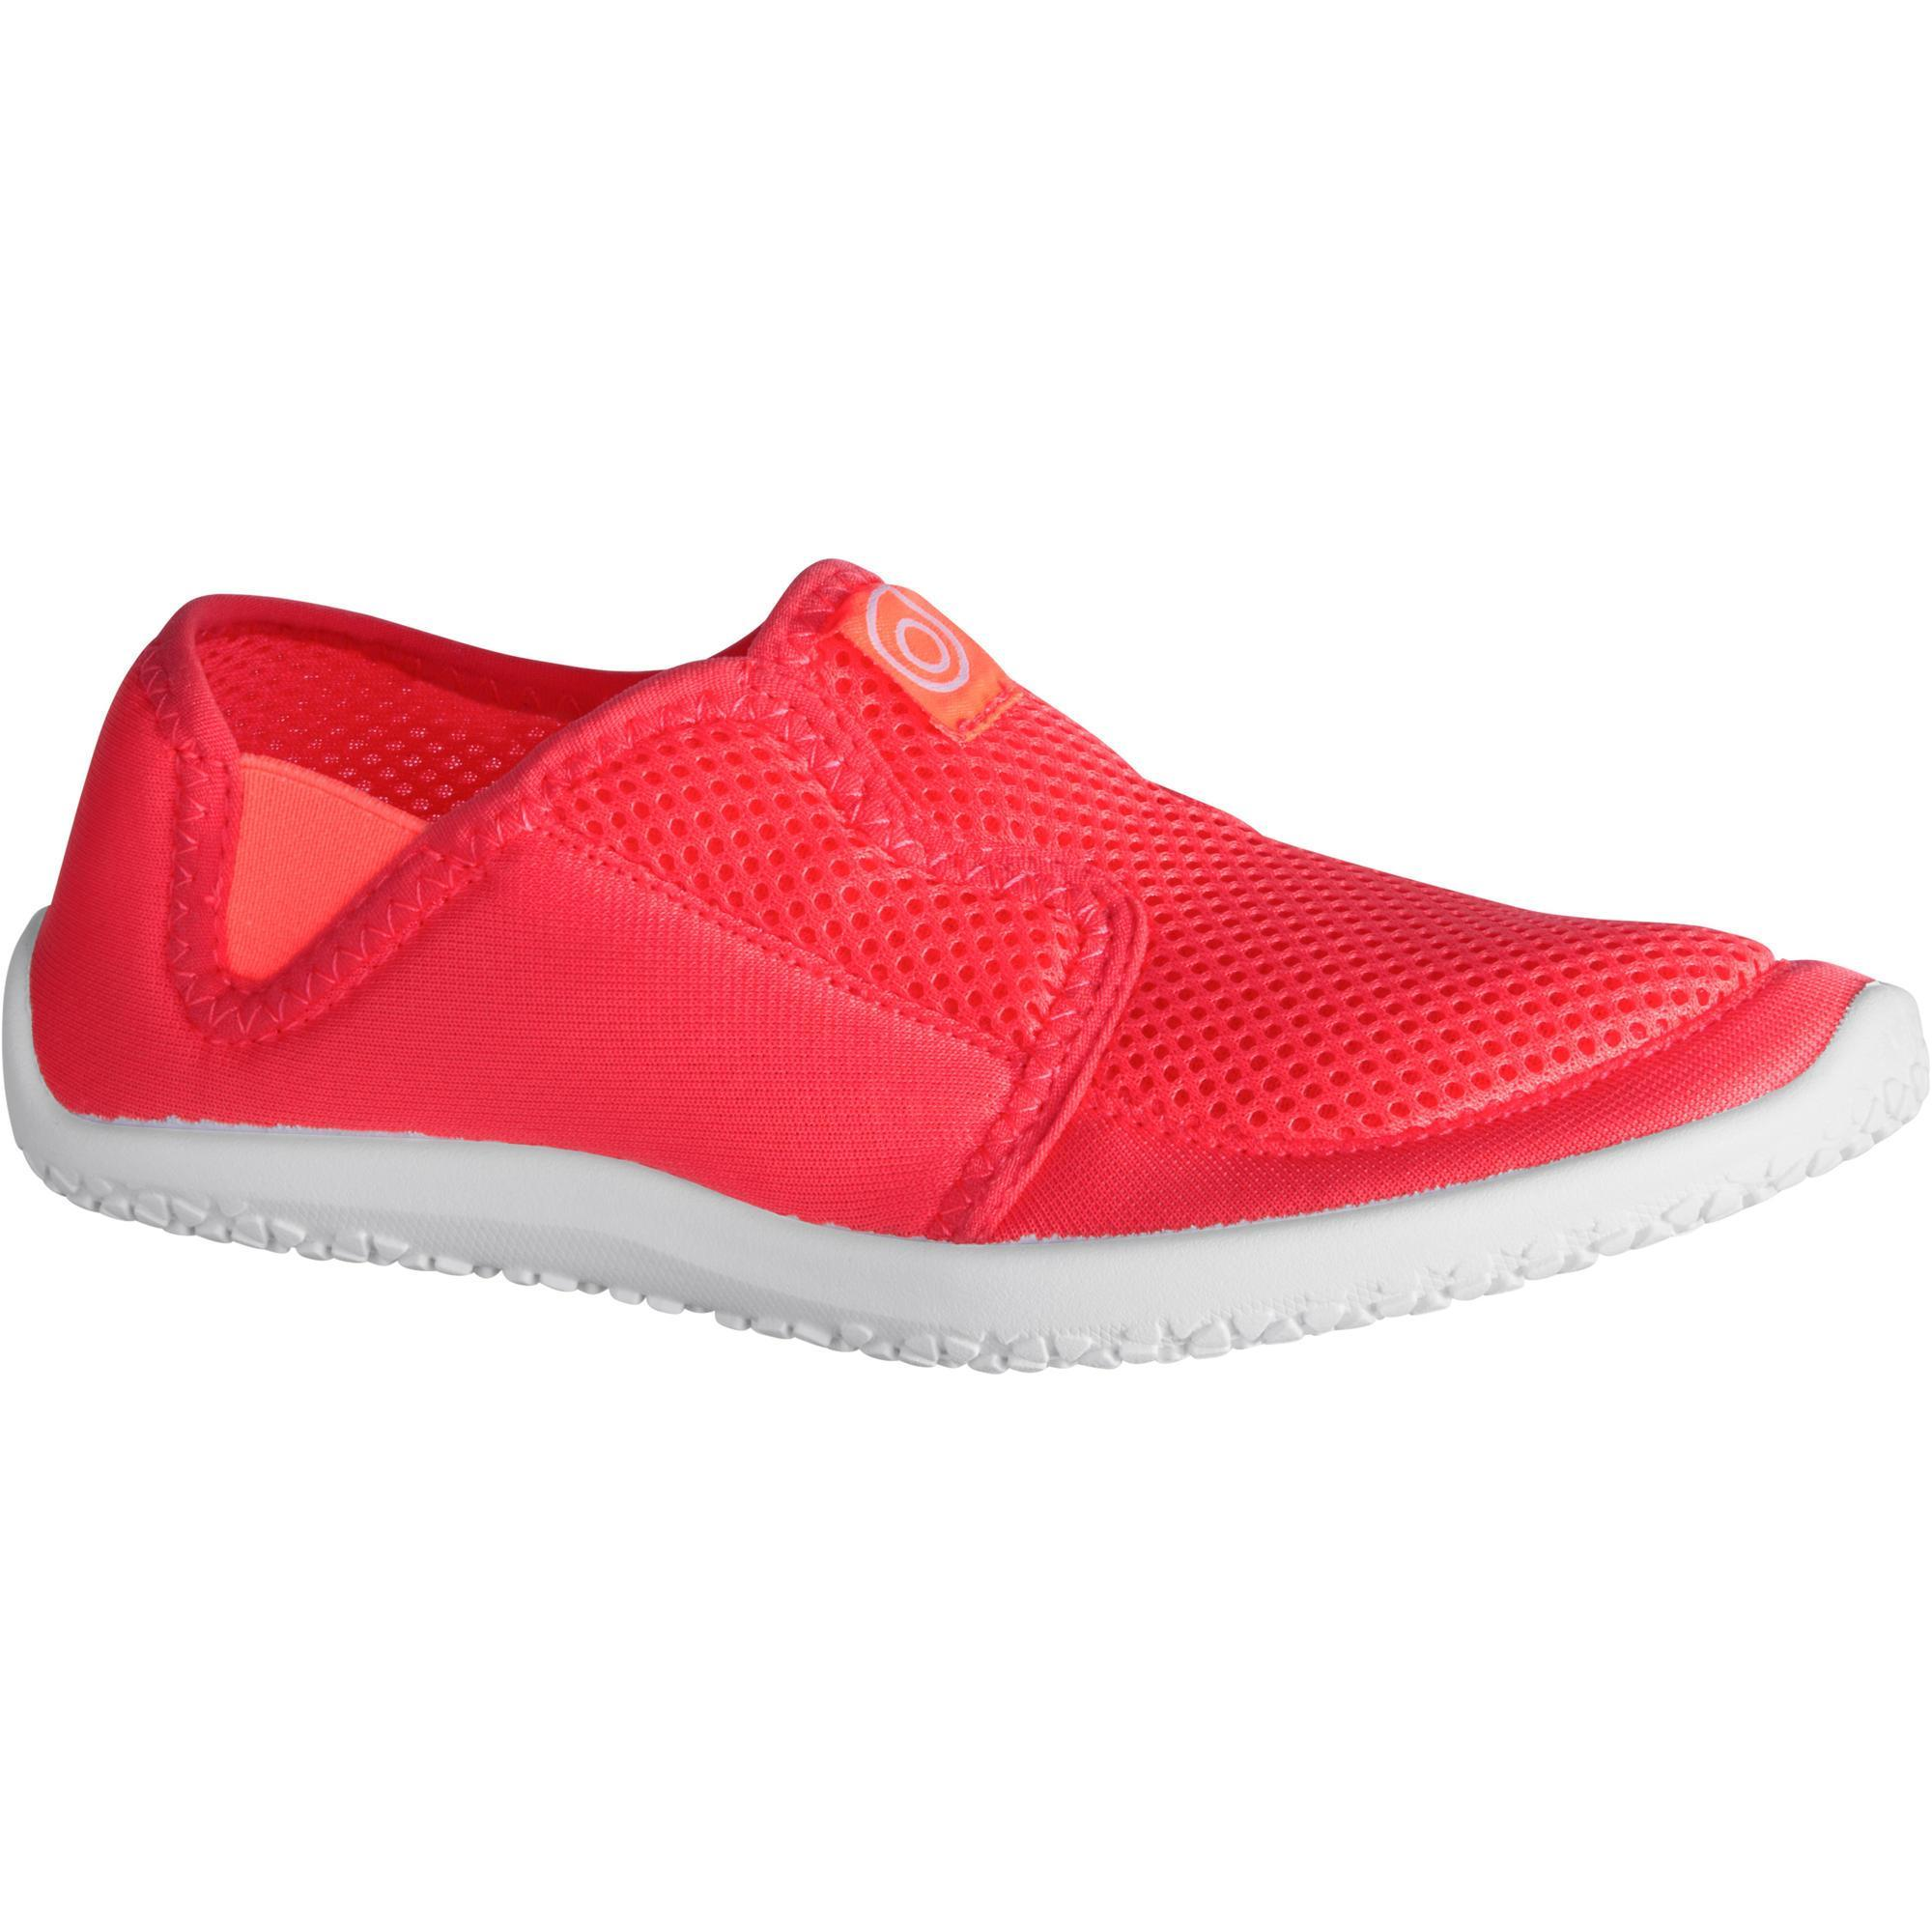 Chaussures aquatiques Aquashoes 120 enfant rose corail - Subea